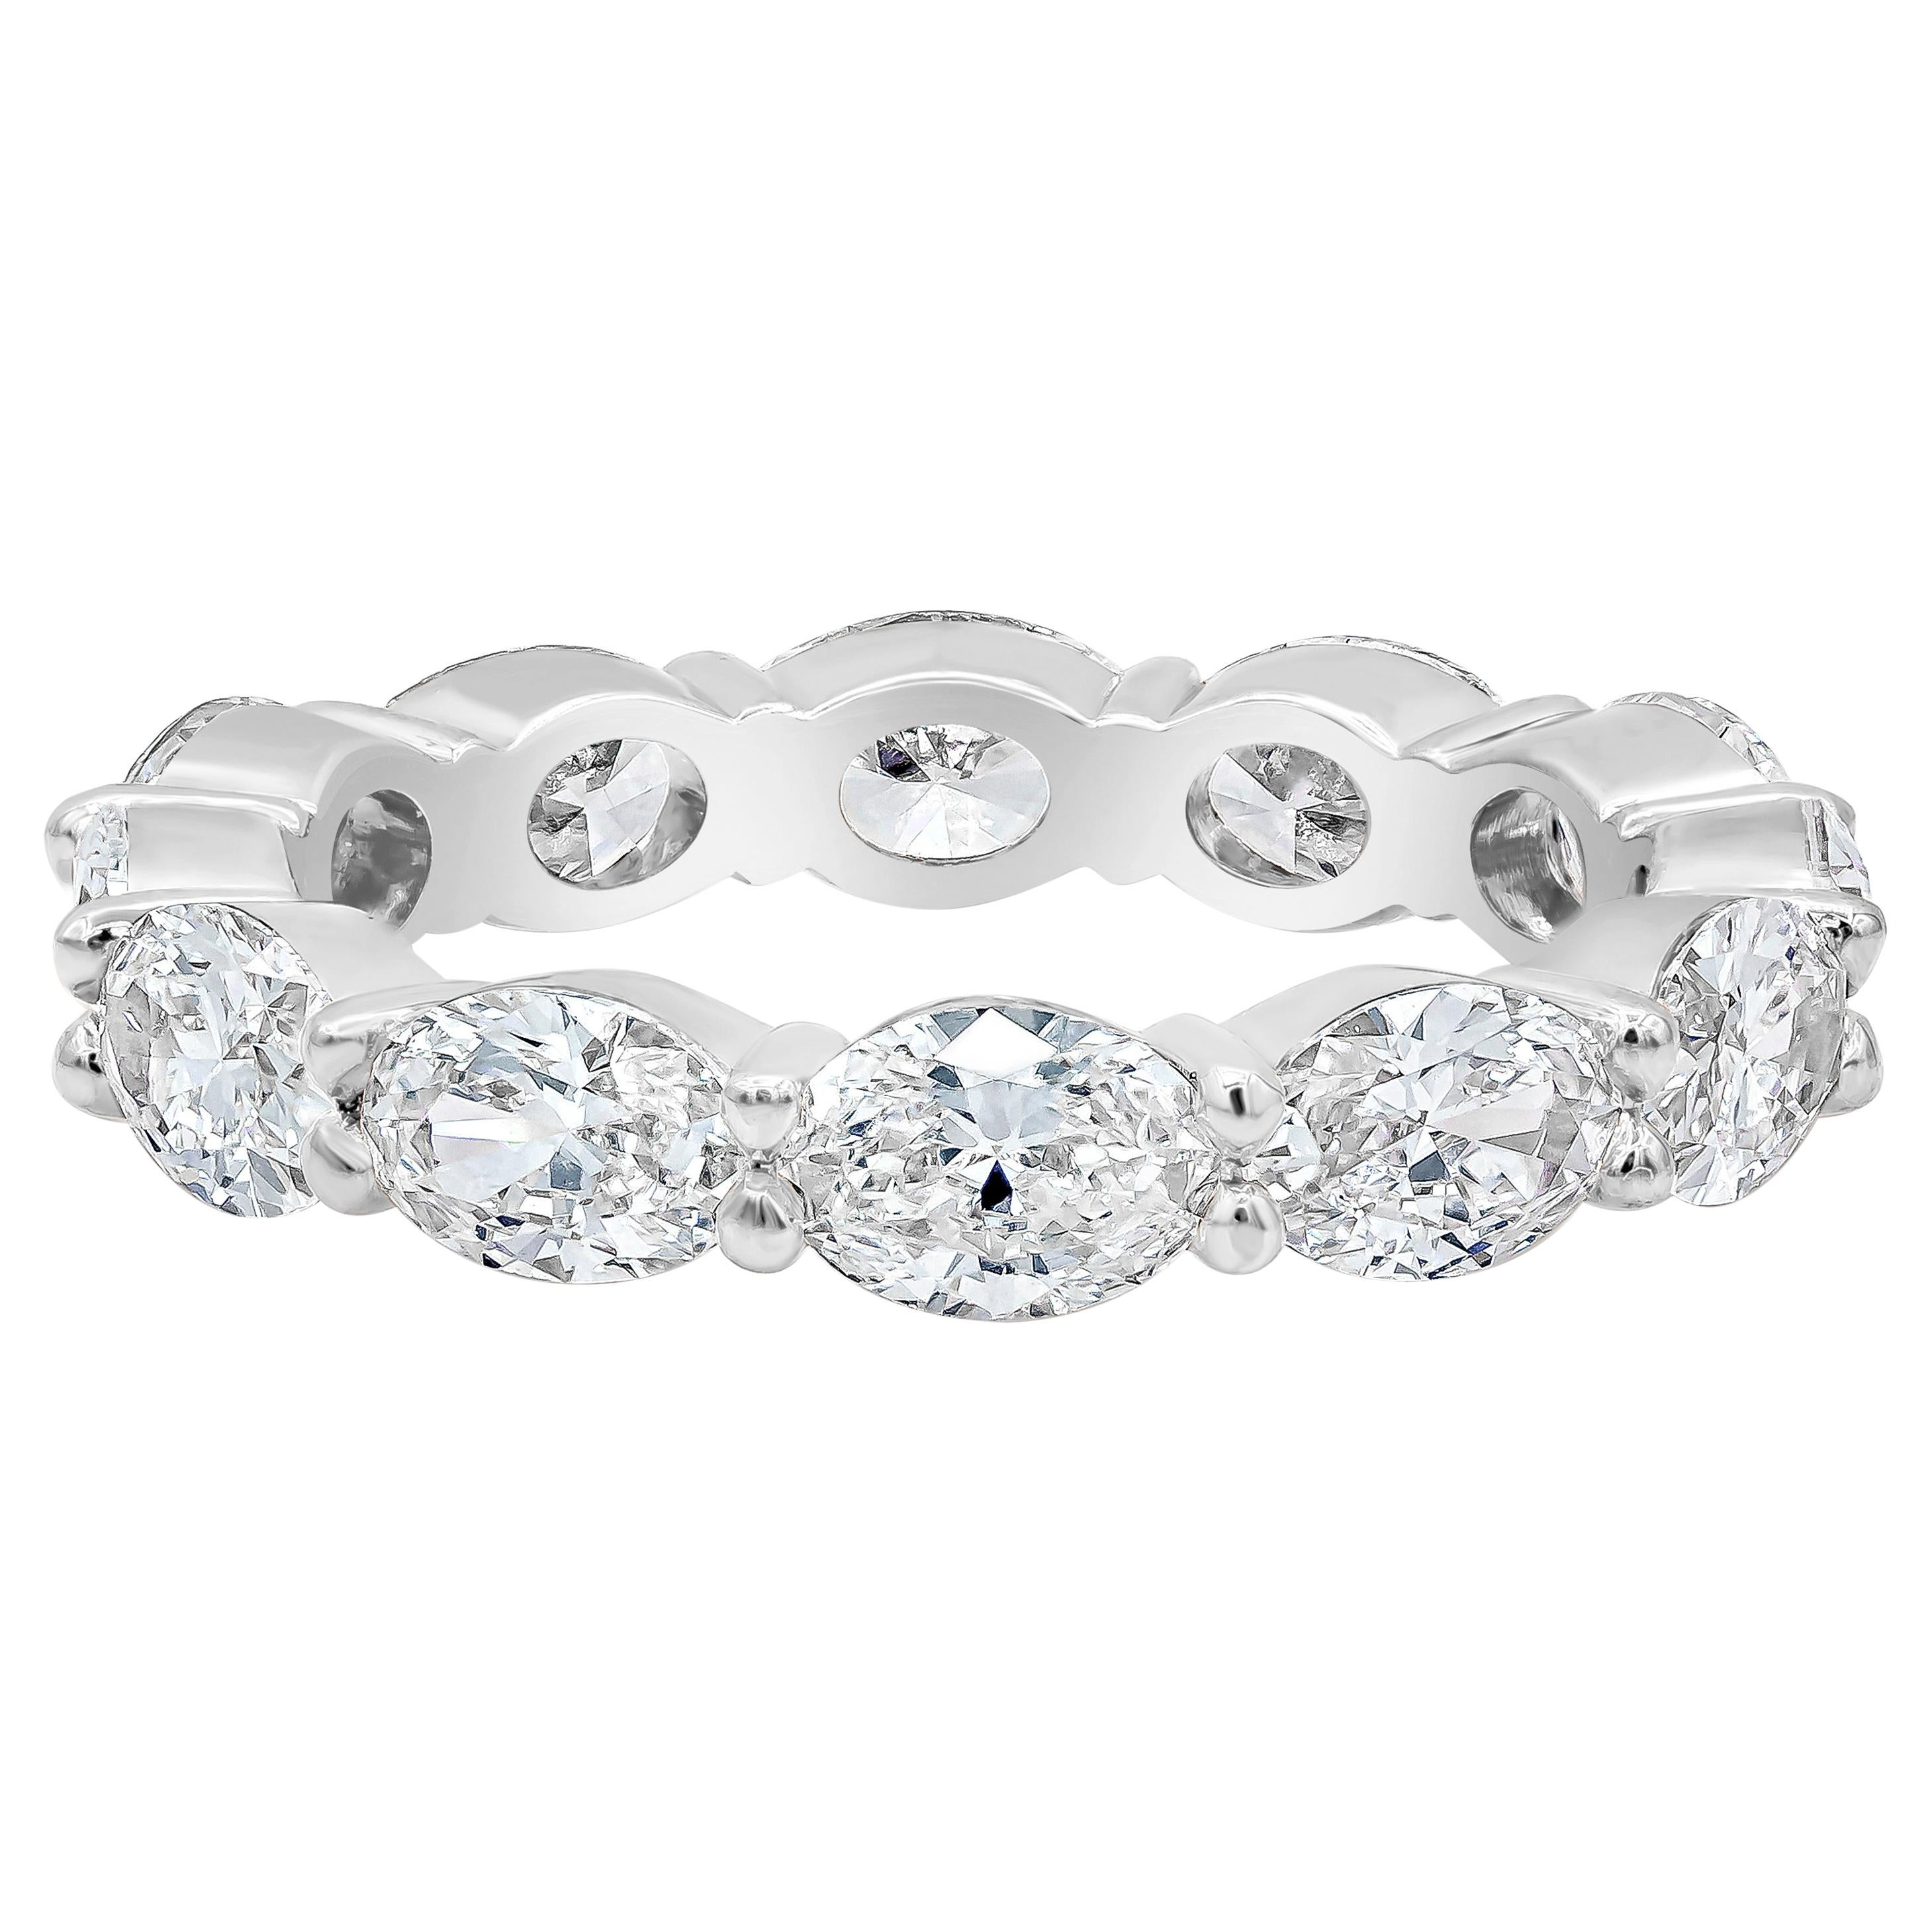 Roman Malakov 2.82 Carat Oval Cut Diamond East-West Eternity Wedding Band